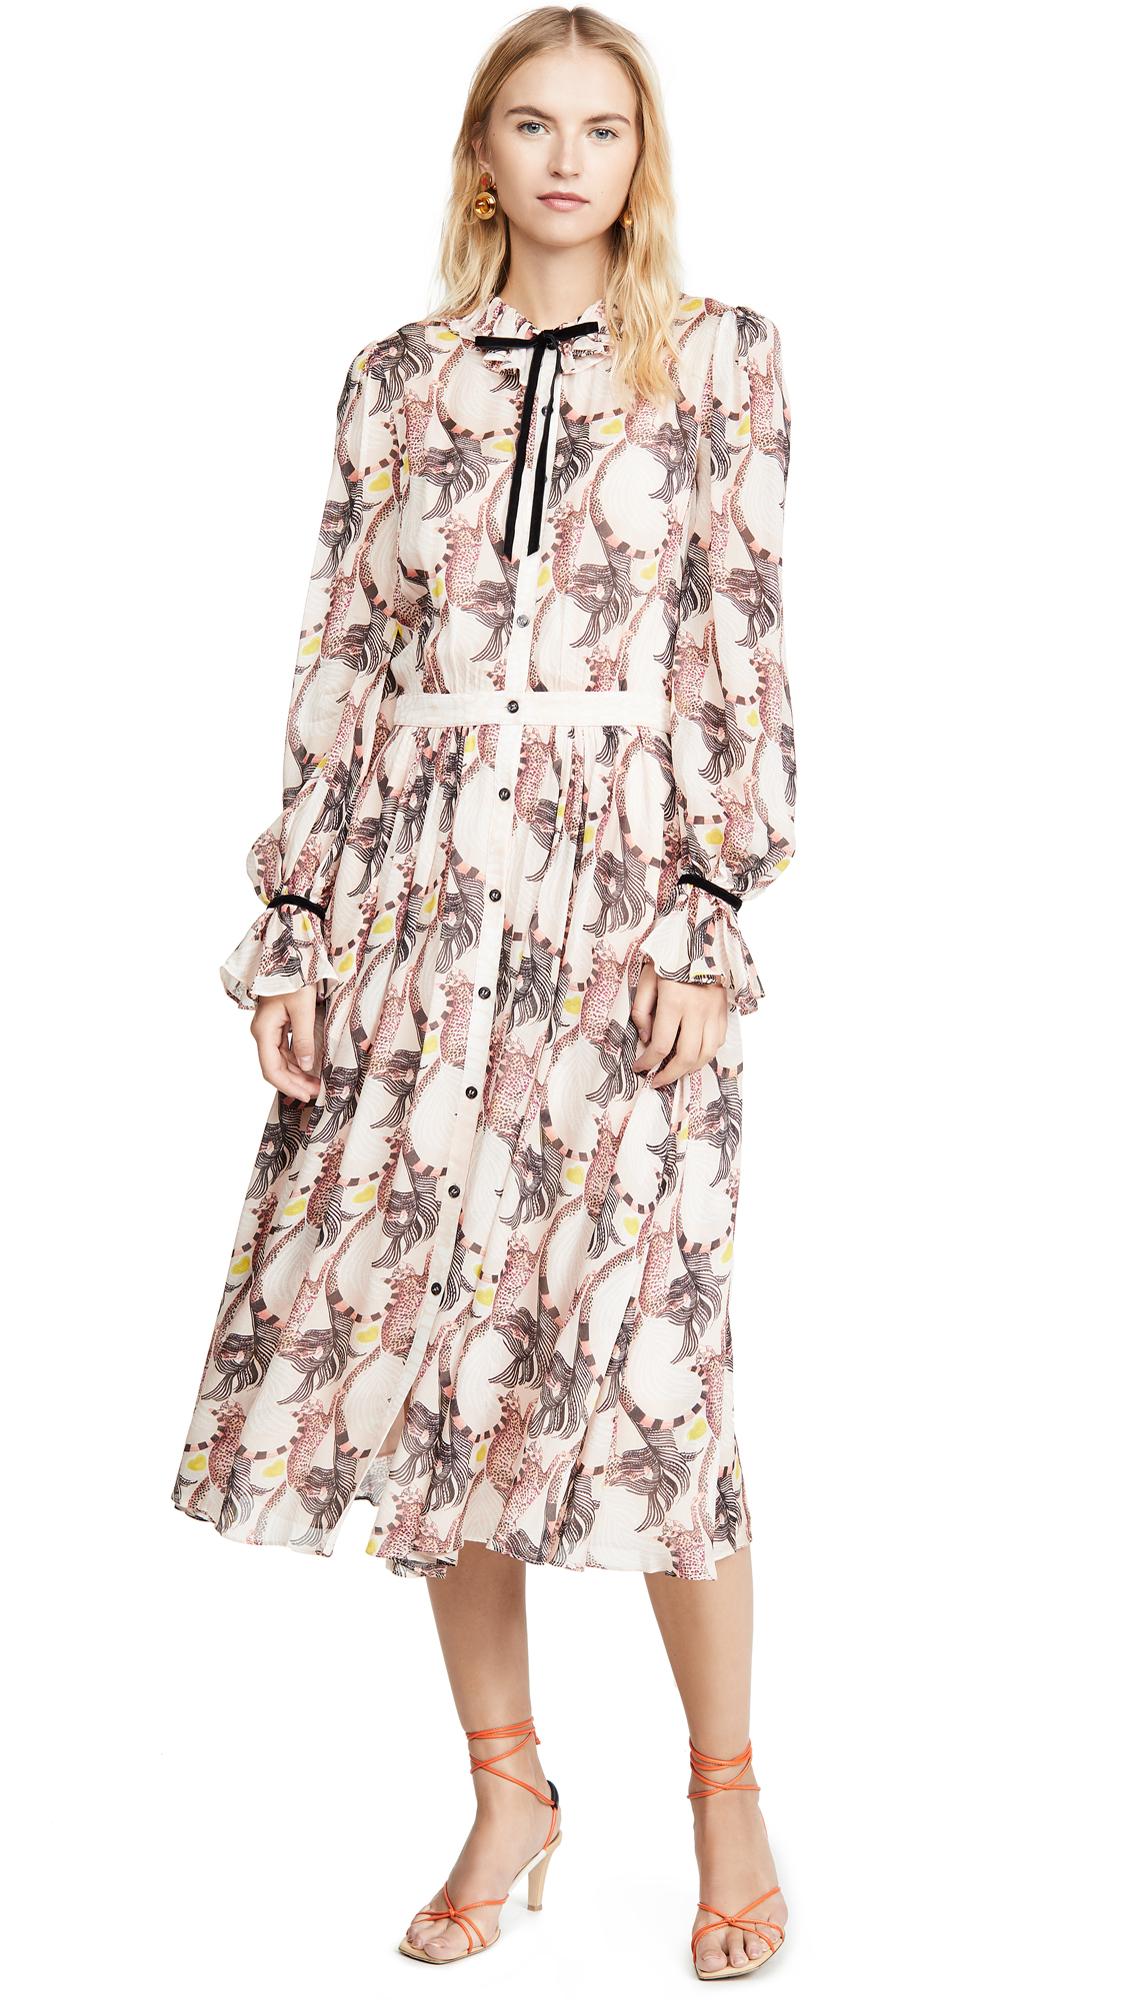 Buy Temperley London Maggie Collar Dress online beautiful Temperley London Dresses, Strapless